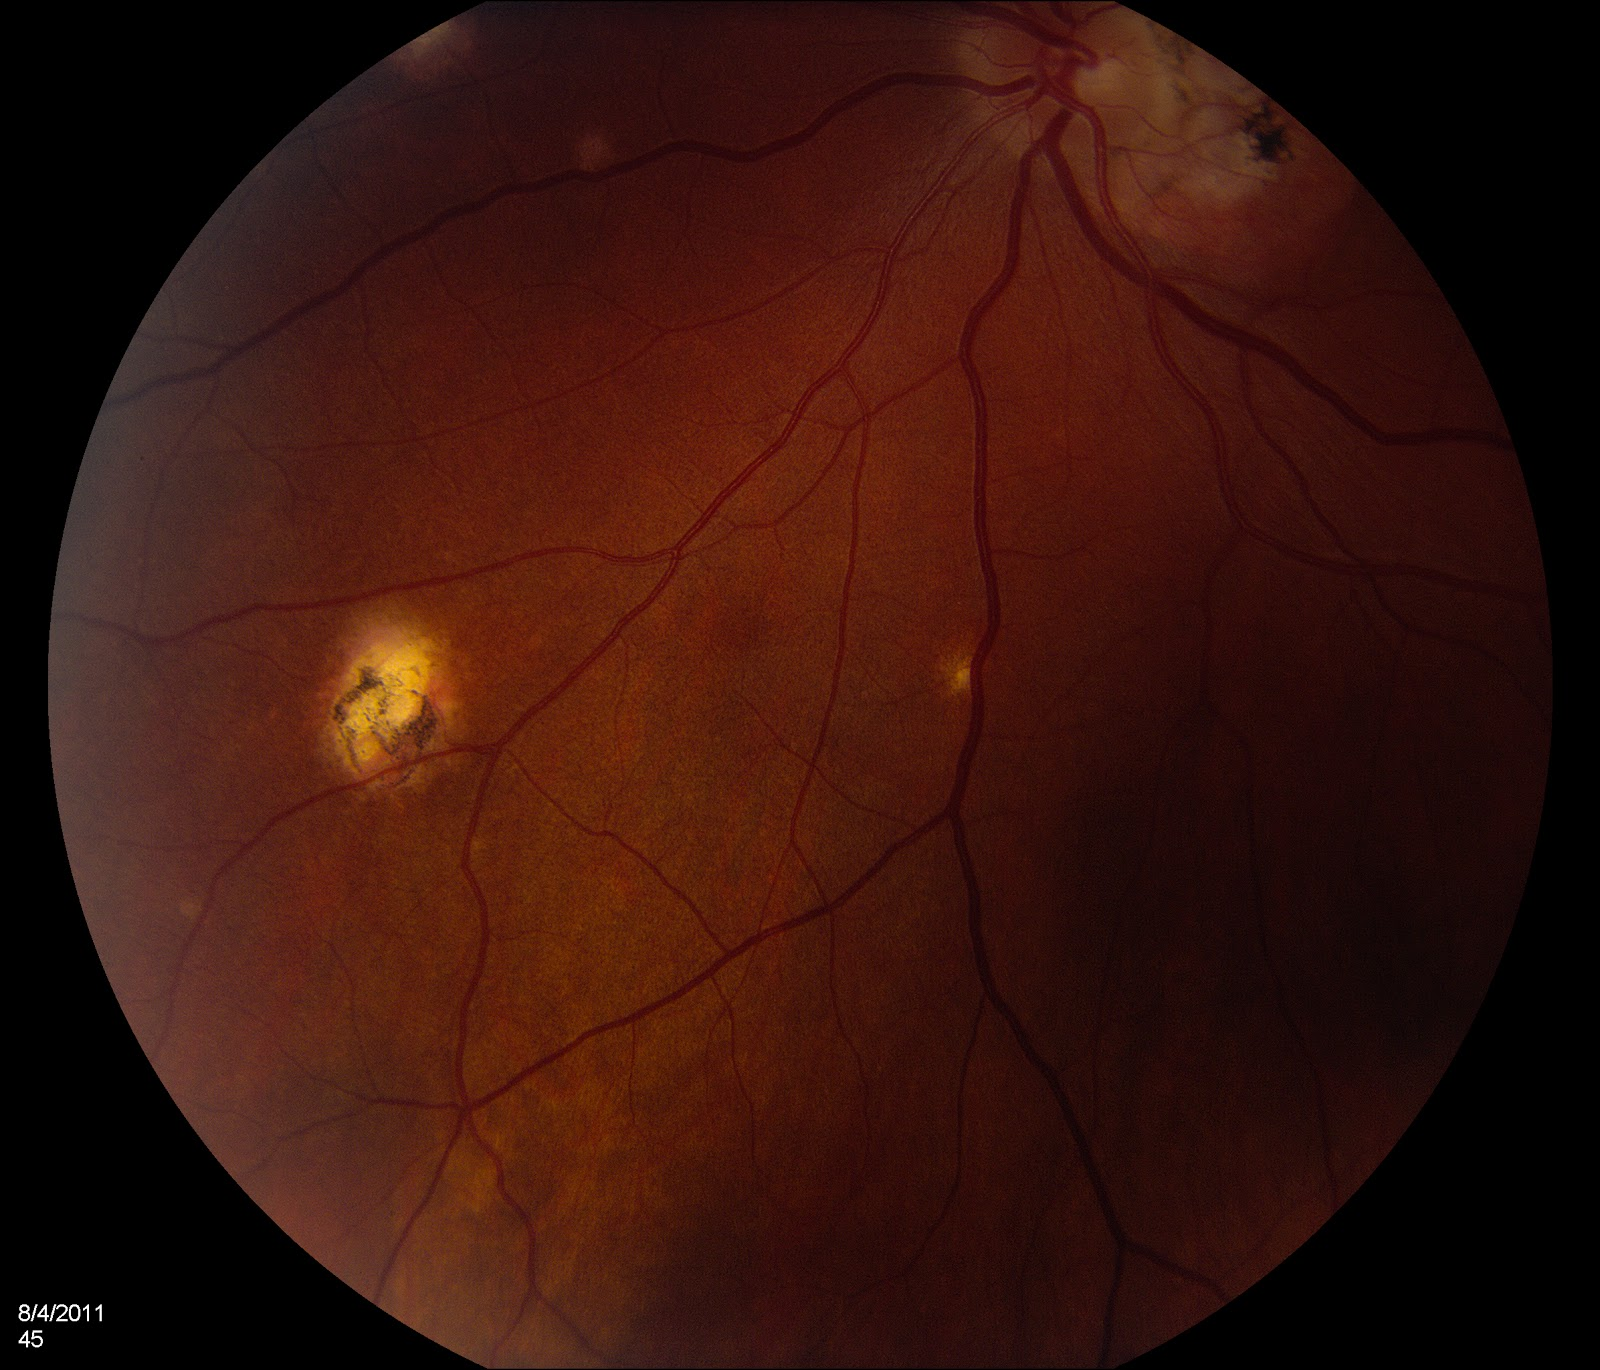 Ocular Histoplasmosis  Presumed Ocular Histoplasmosis Syndrome